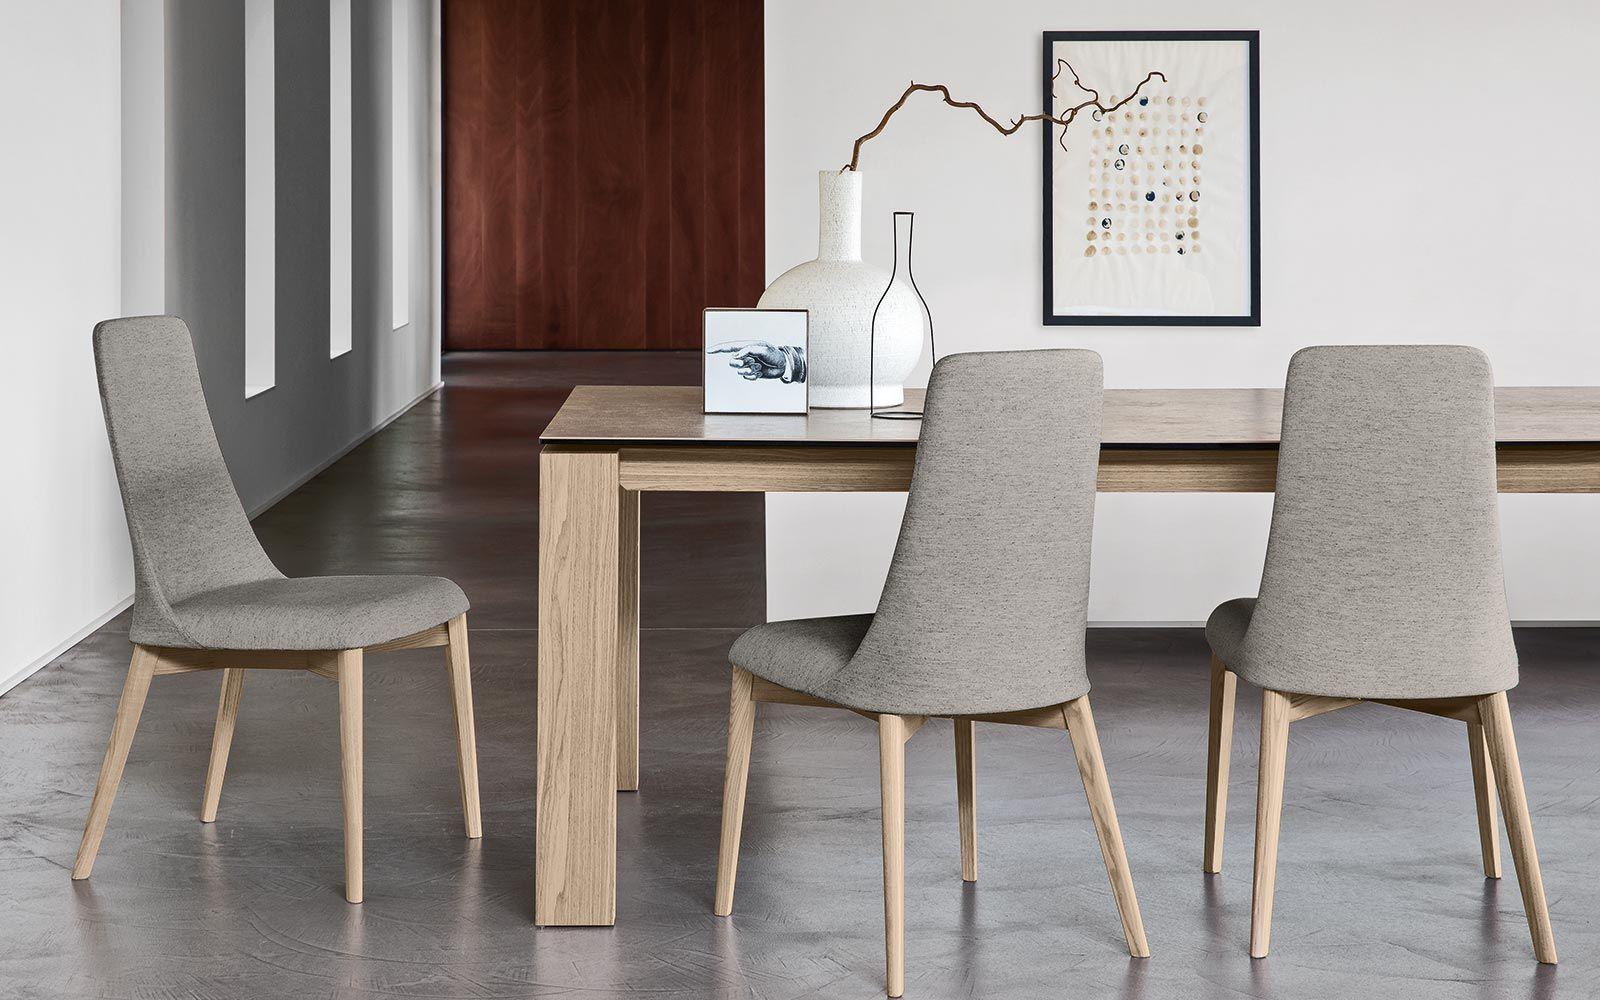 Tavolo in legno super allungabile Omnia Xxl - Calligaris CS/4058 ...